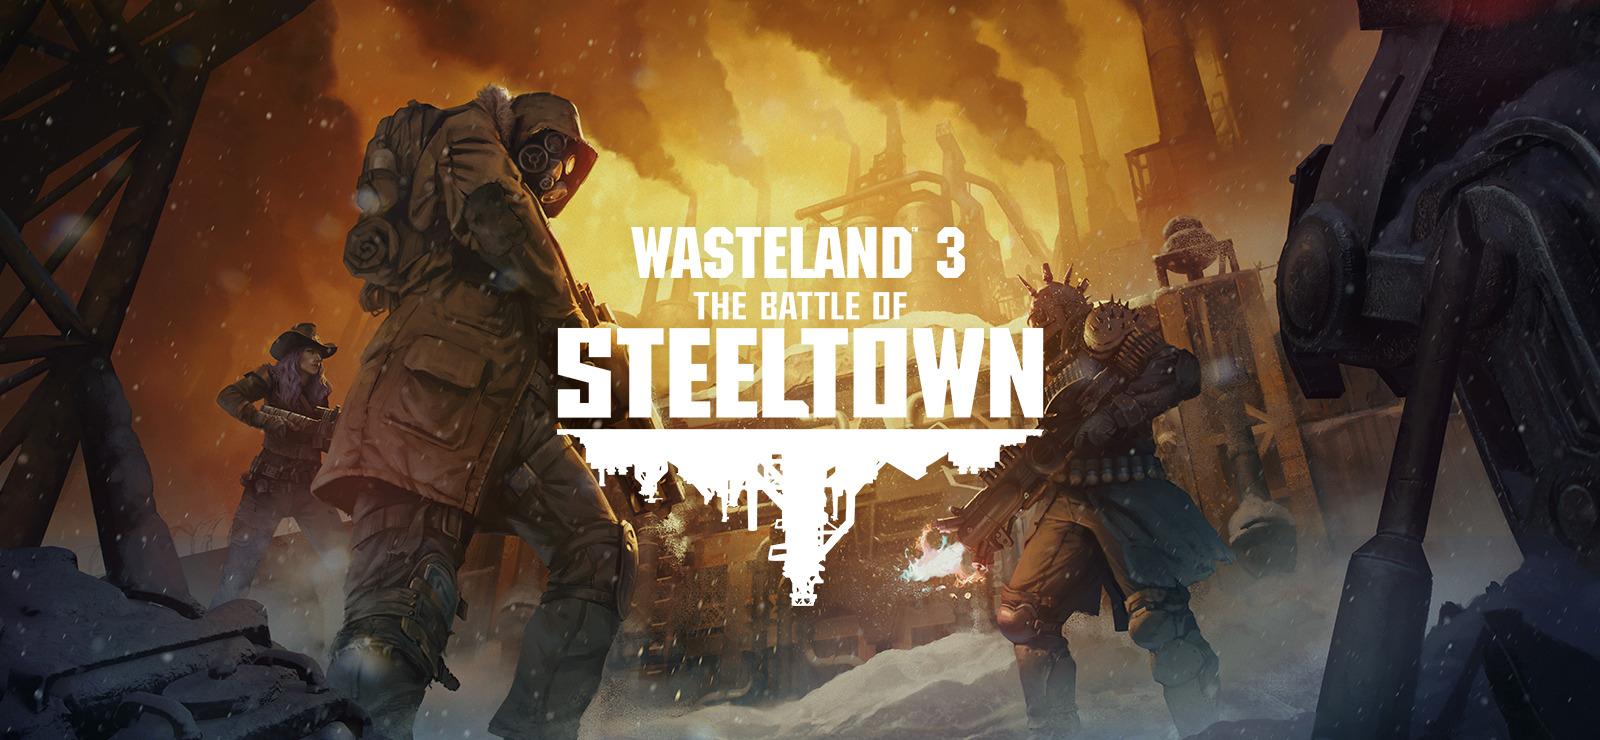 Walkthrough Wasteland 3: The Battle of Steeltown - game guide